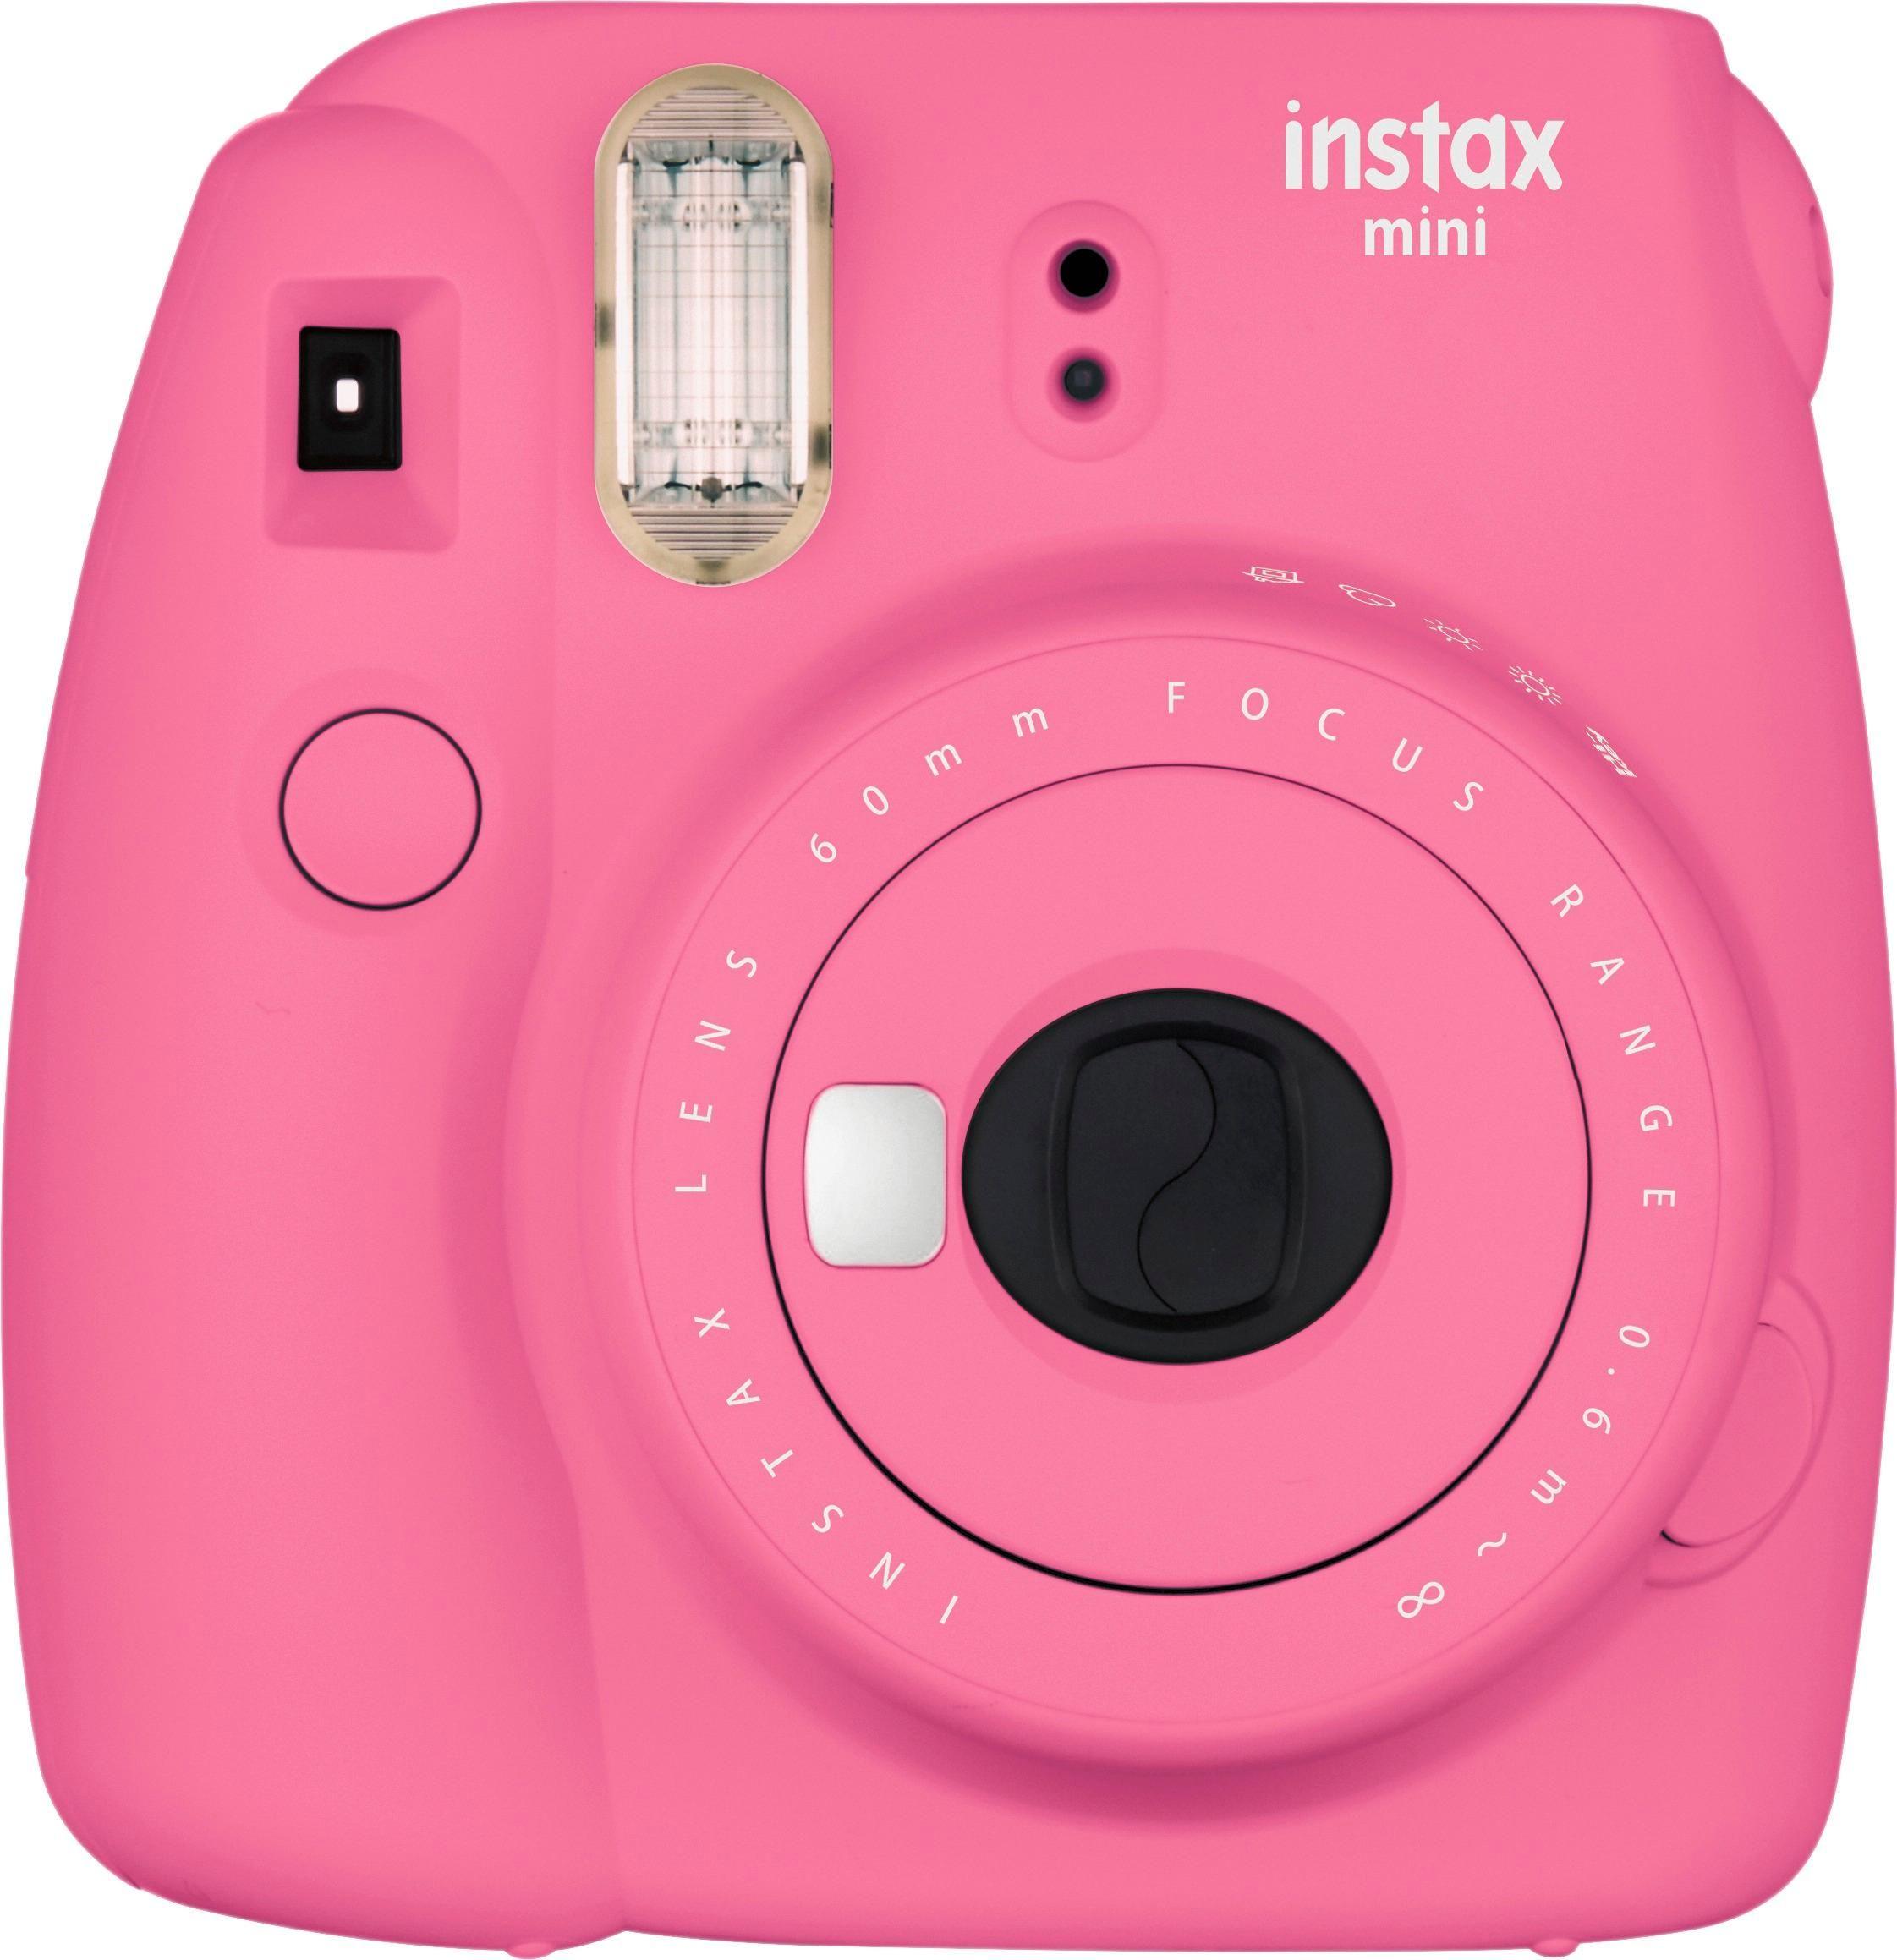 Fujifilm Instax Mini 9 Instant Film Camera Flamingo Pink 16550631